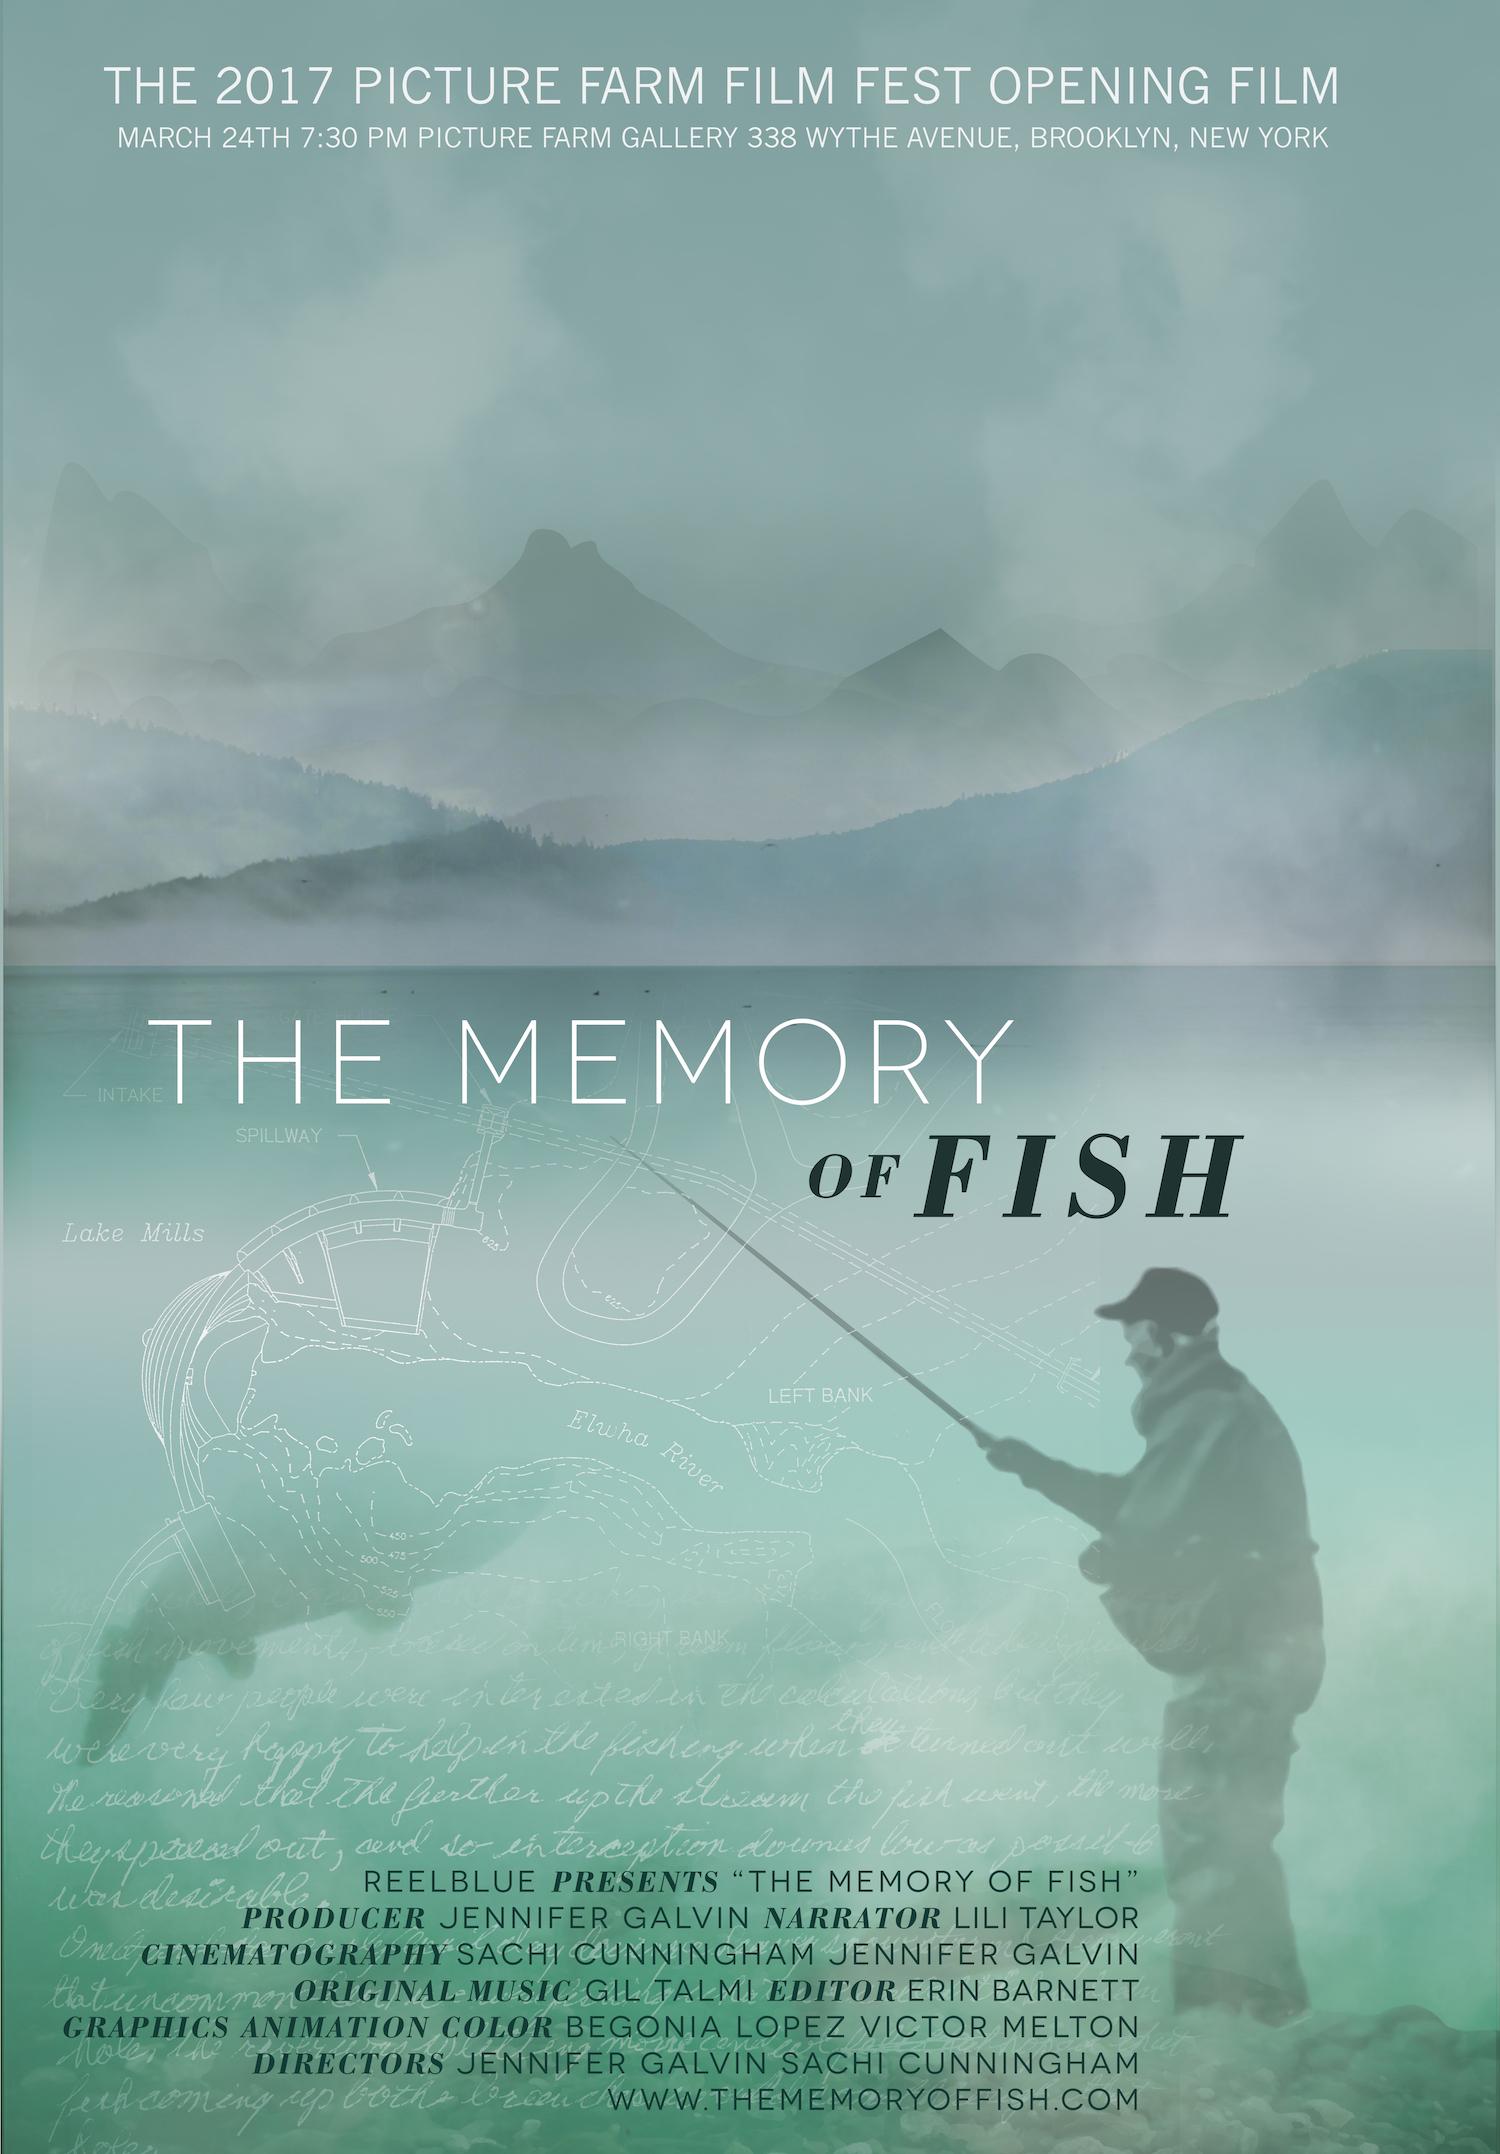 Memory of Fish PF Film Fest